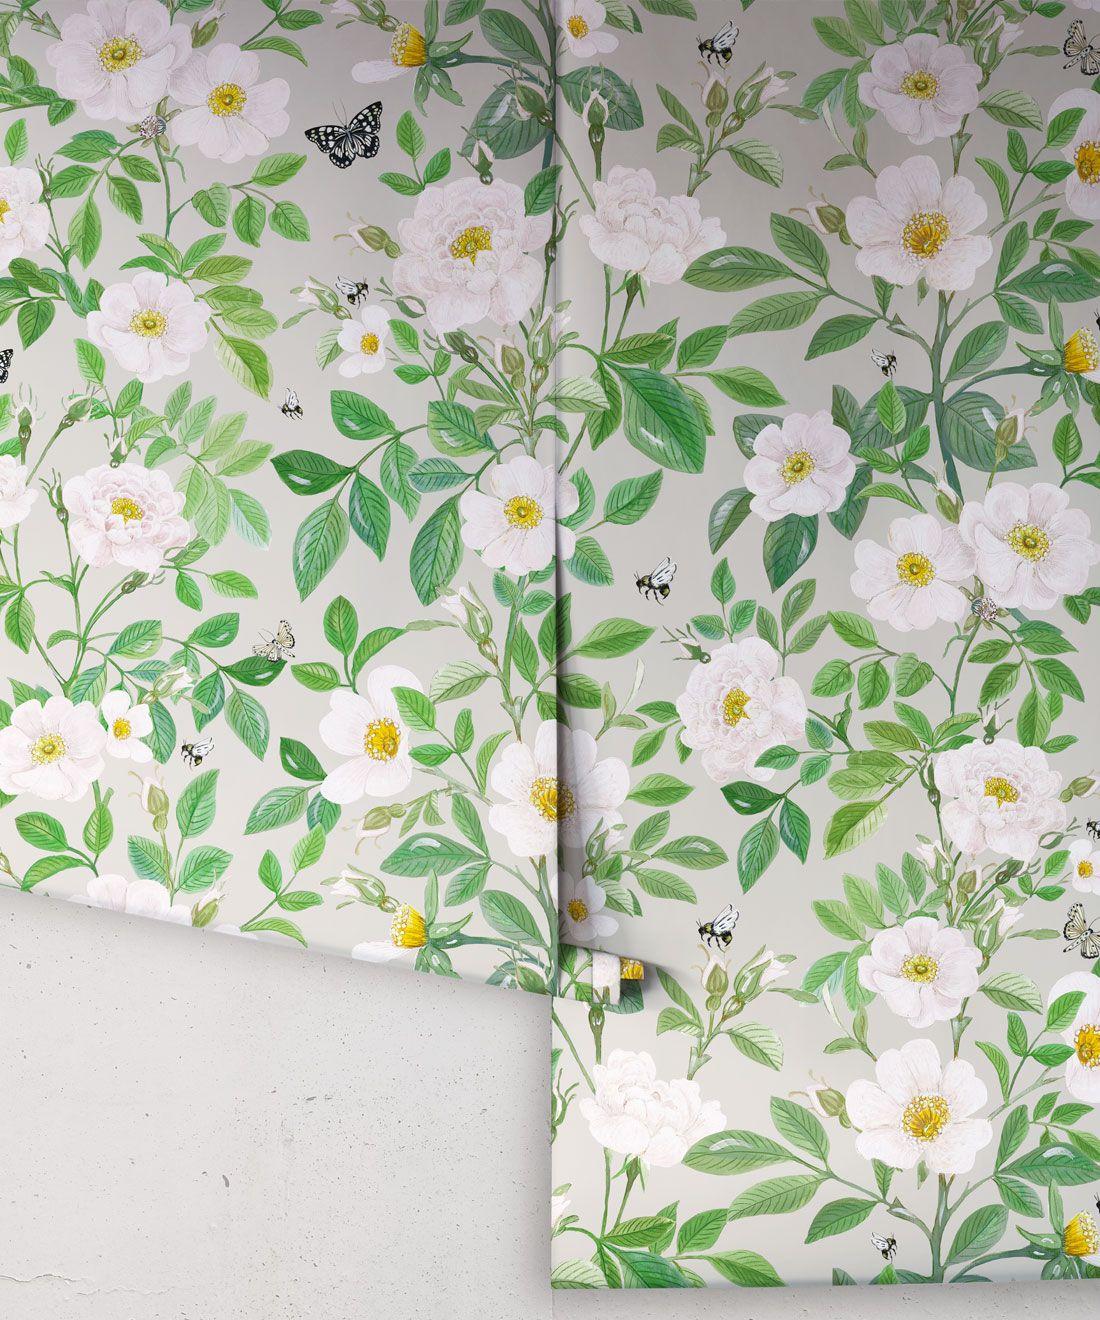 Rosa Wallpaper • Floral Wallpaper • Beige •Roll